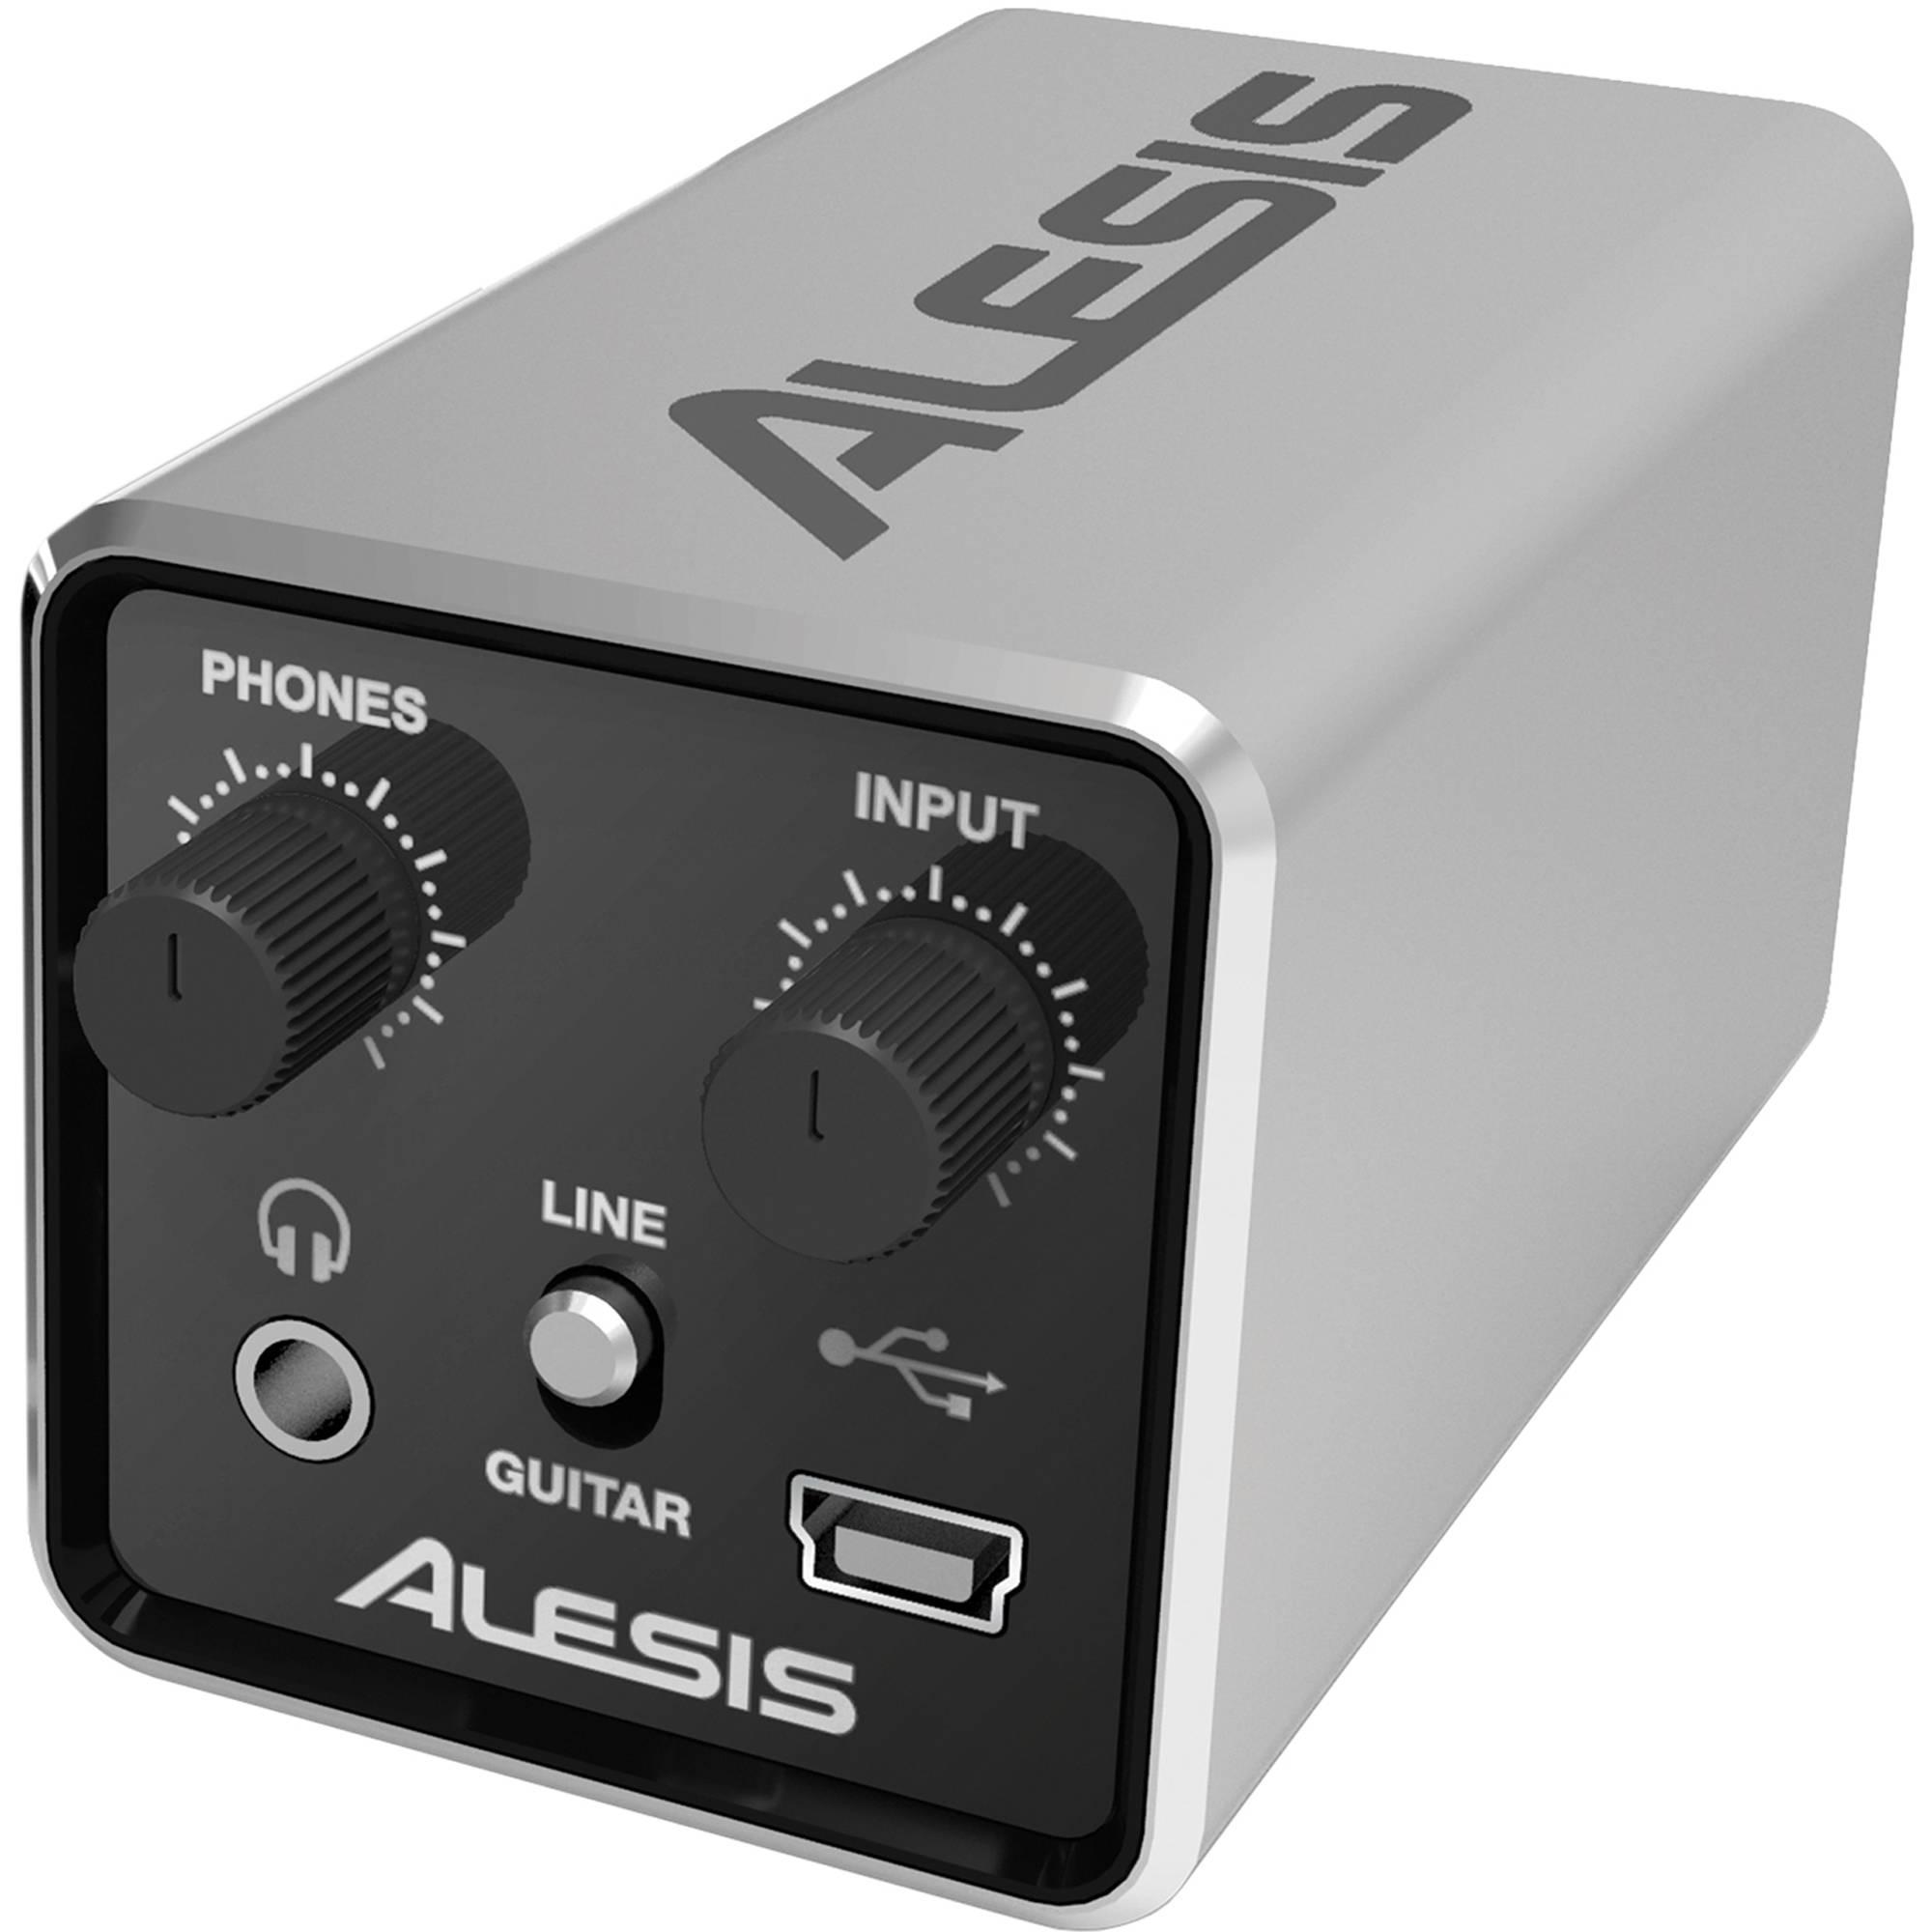 Alesis Core 1 24 Bit Inline Usb Audio Interface Bh Photo Relay Switch Box